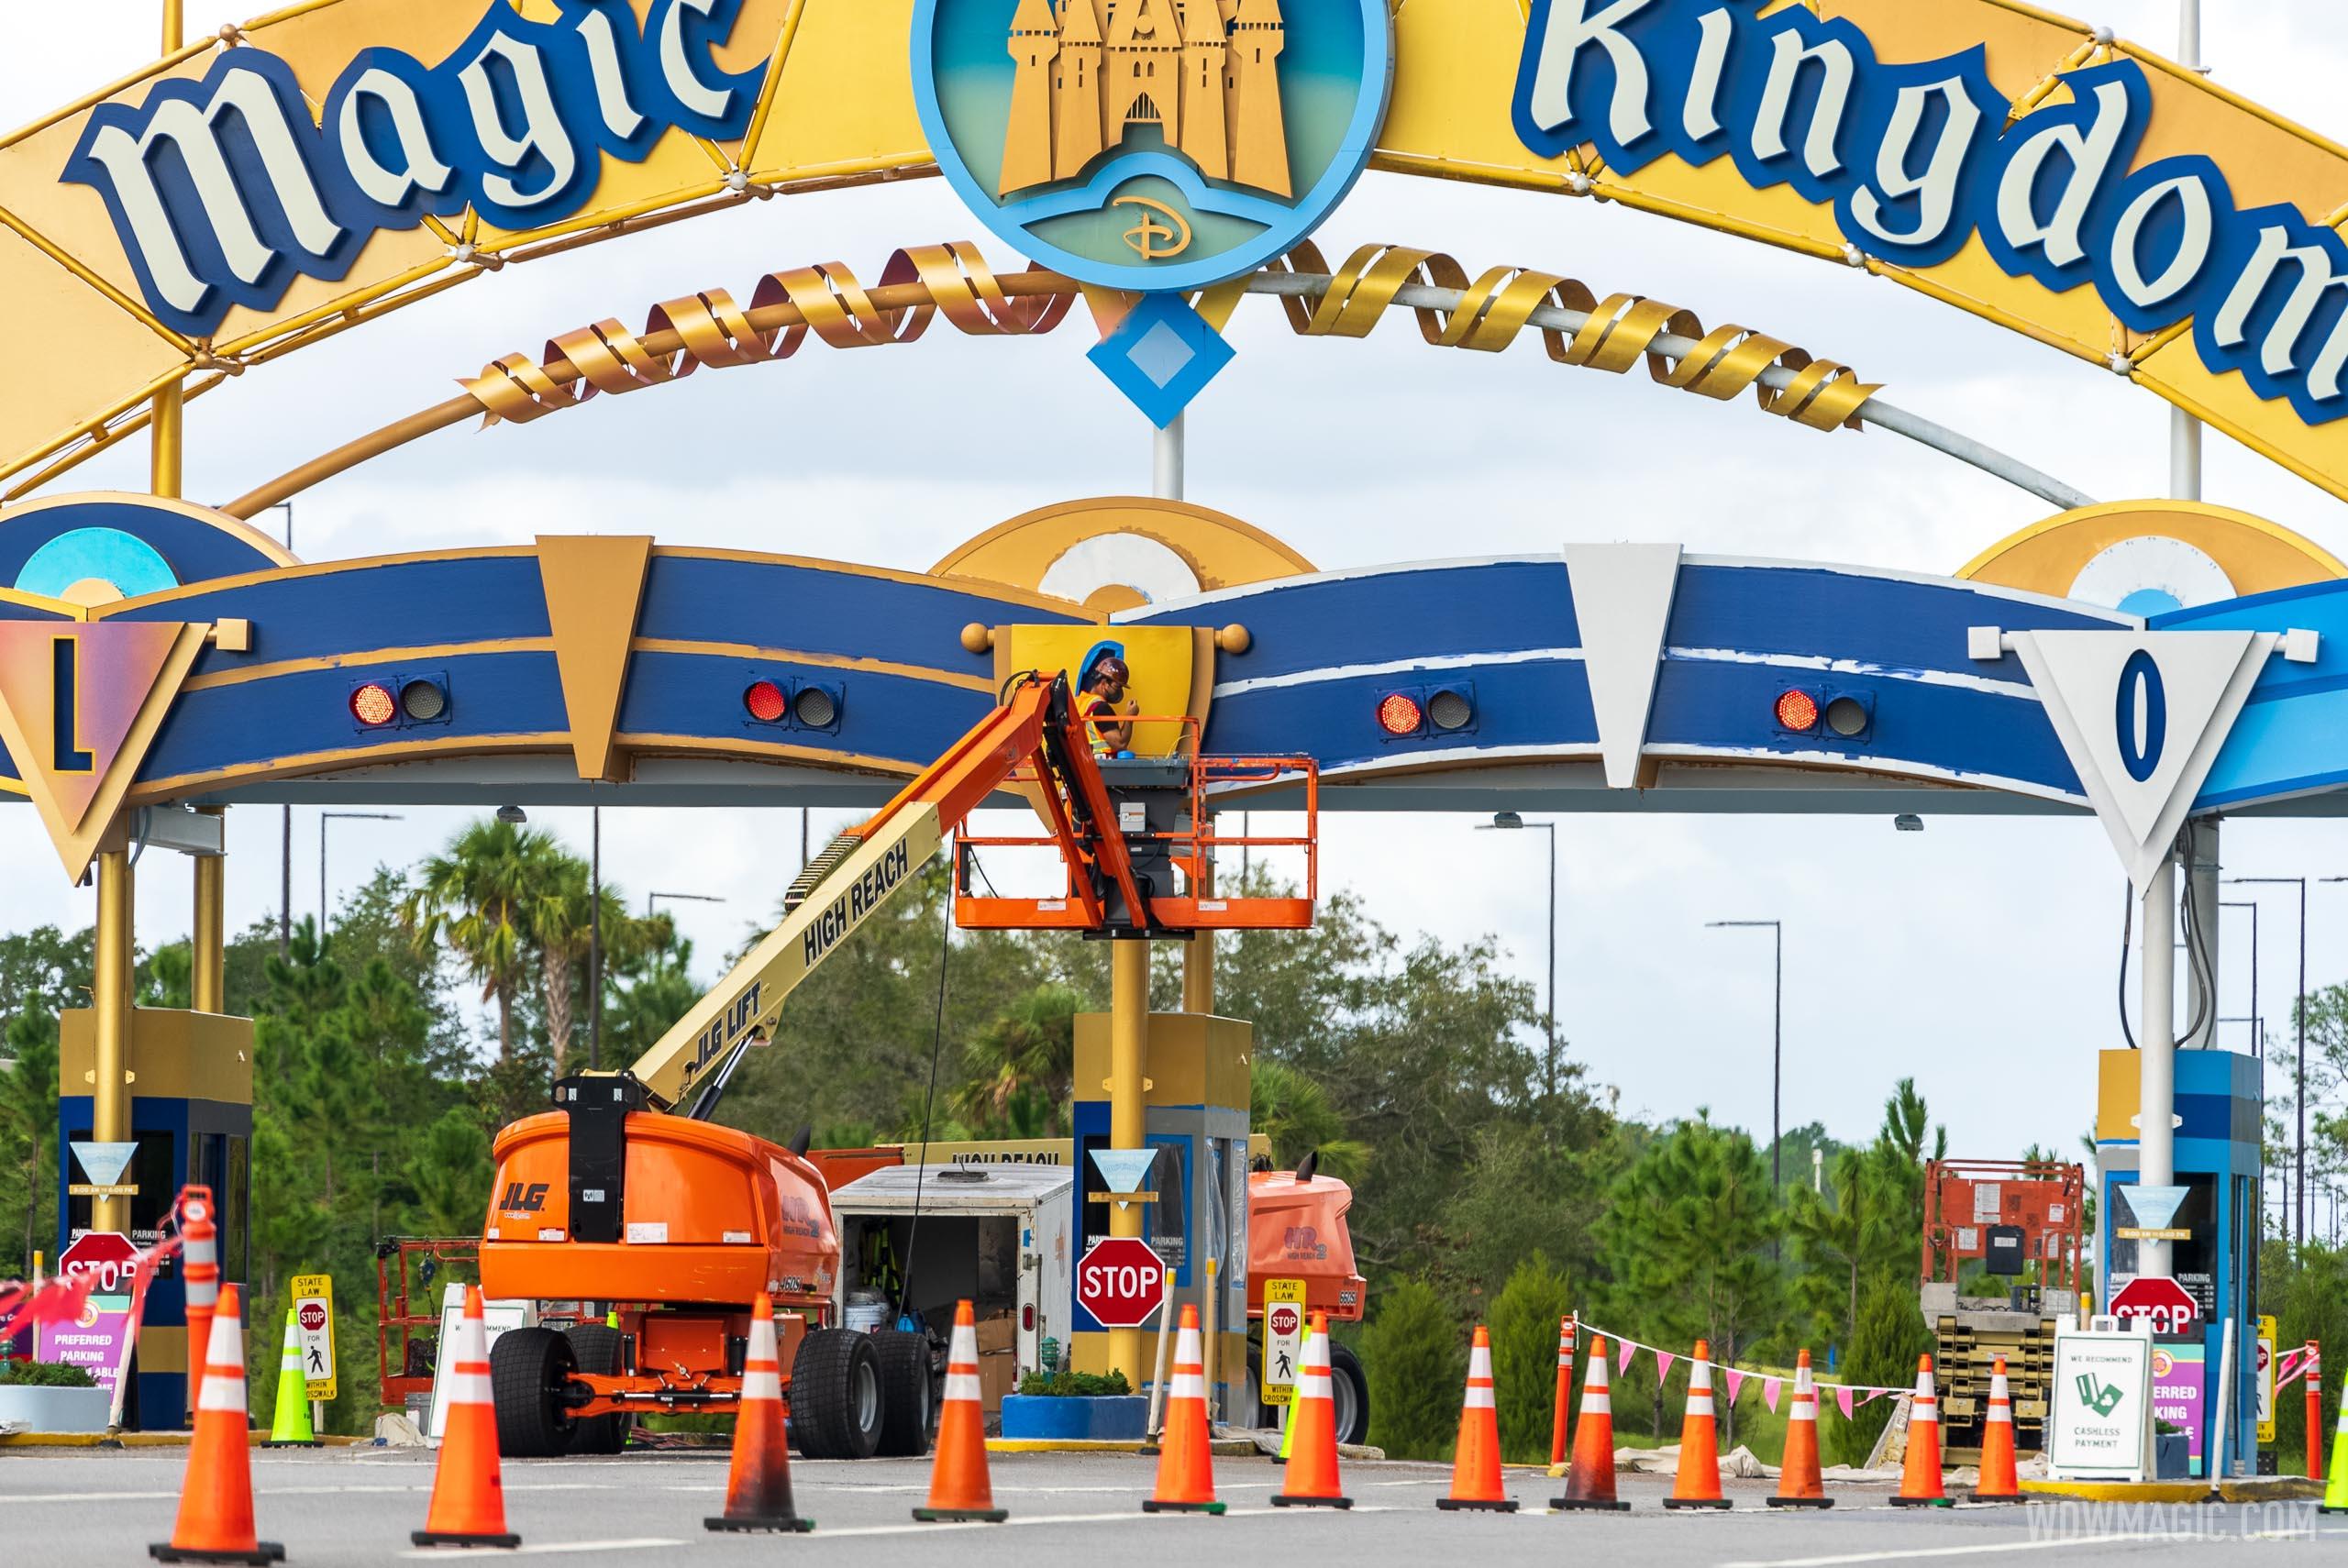 Magic Kingdom auto-plaza refurbishment - October 22 2020